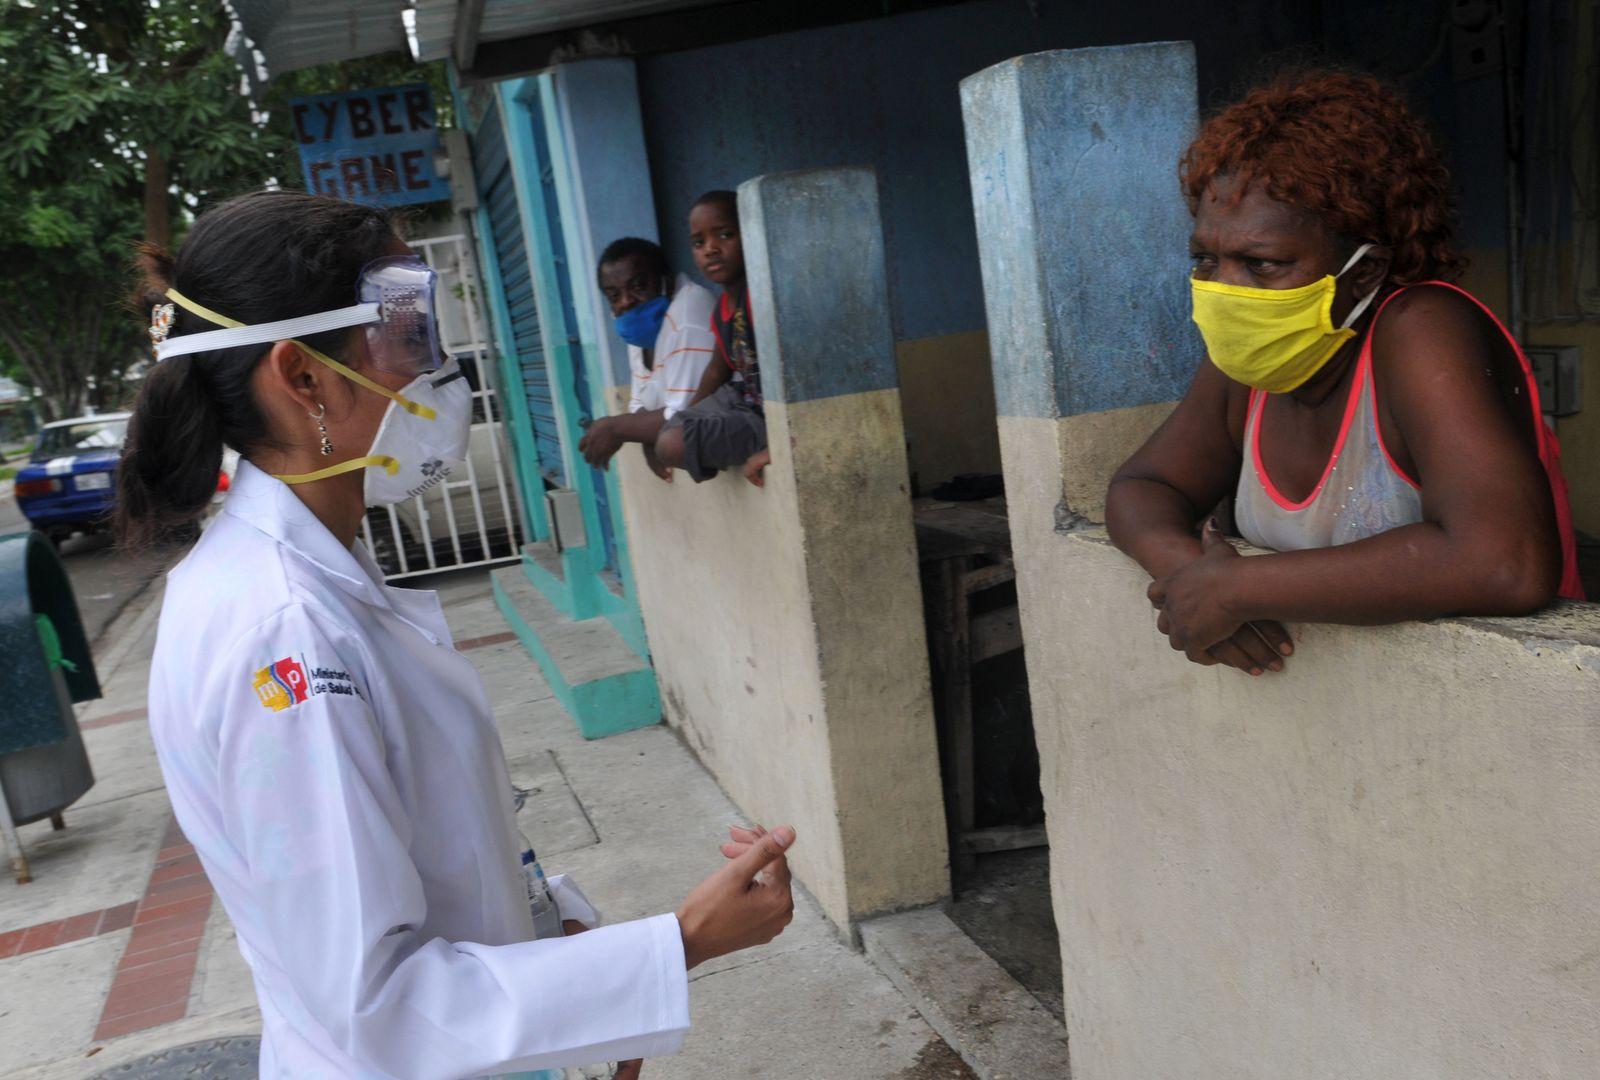 FILES-ECUADOR-HEALTH-VIRUS-INTERNET-DISINFORMATION